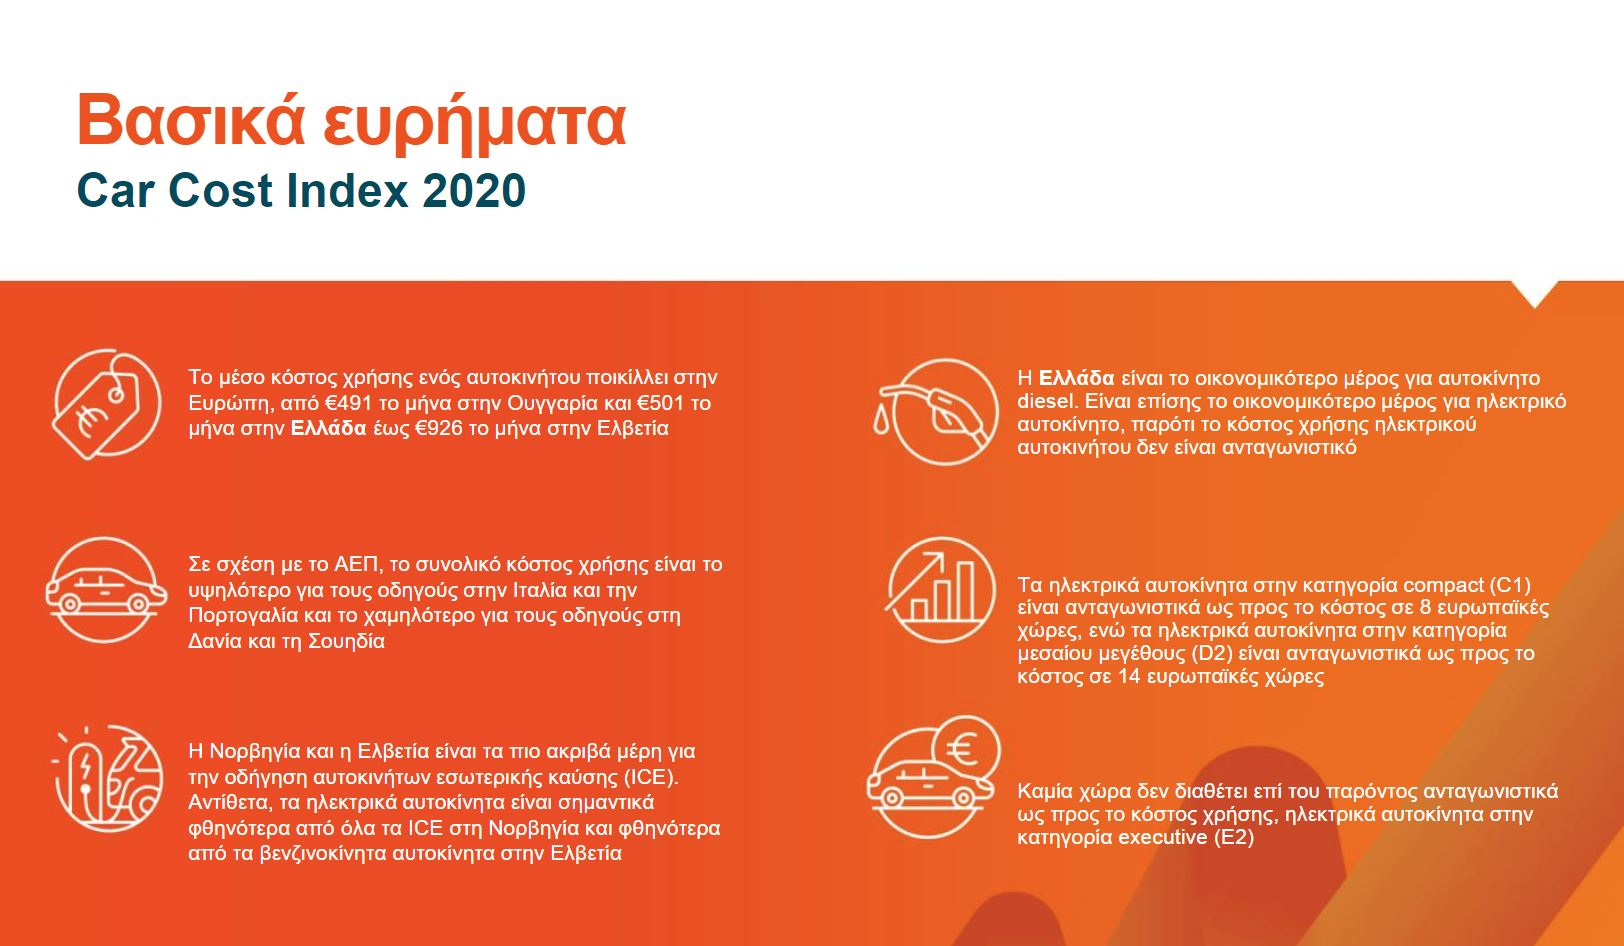 Car-Cost-Index-2020-3